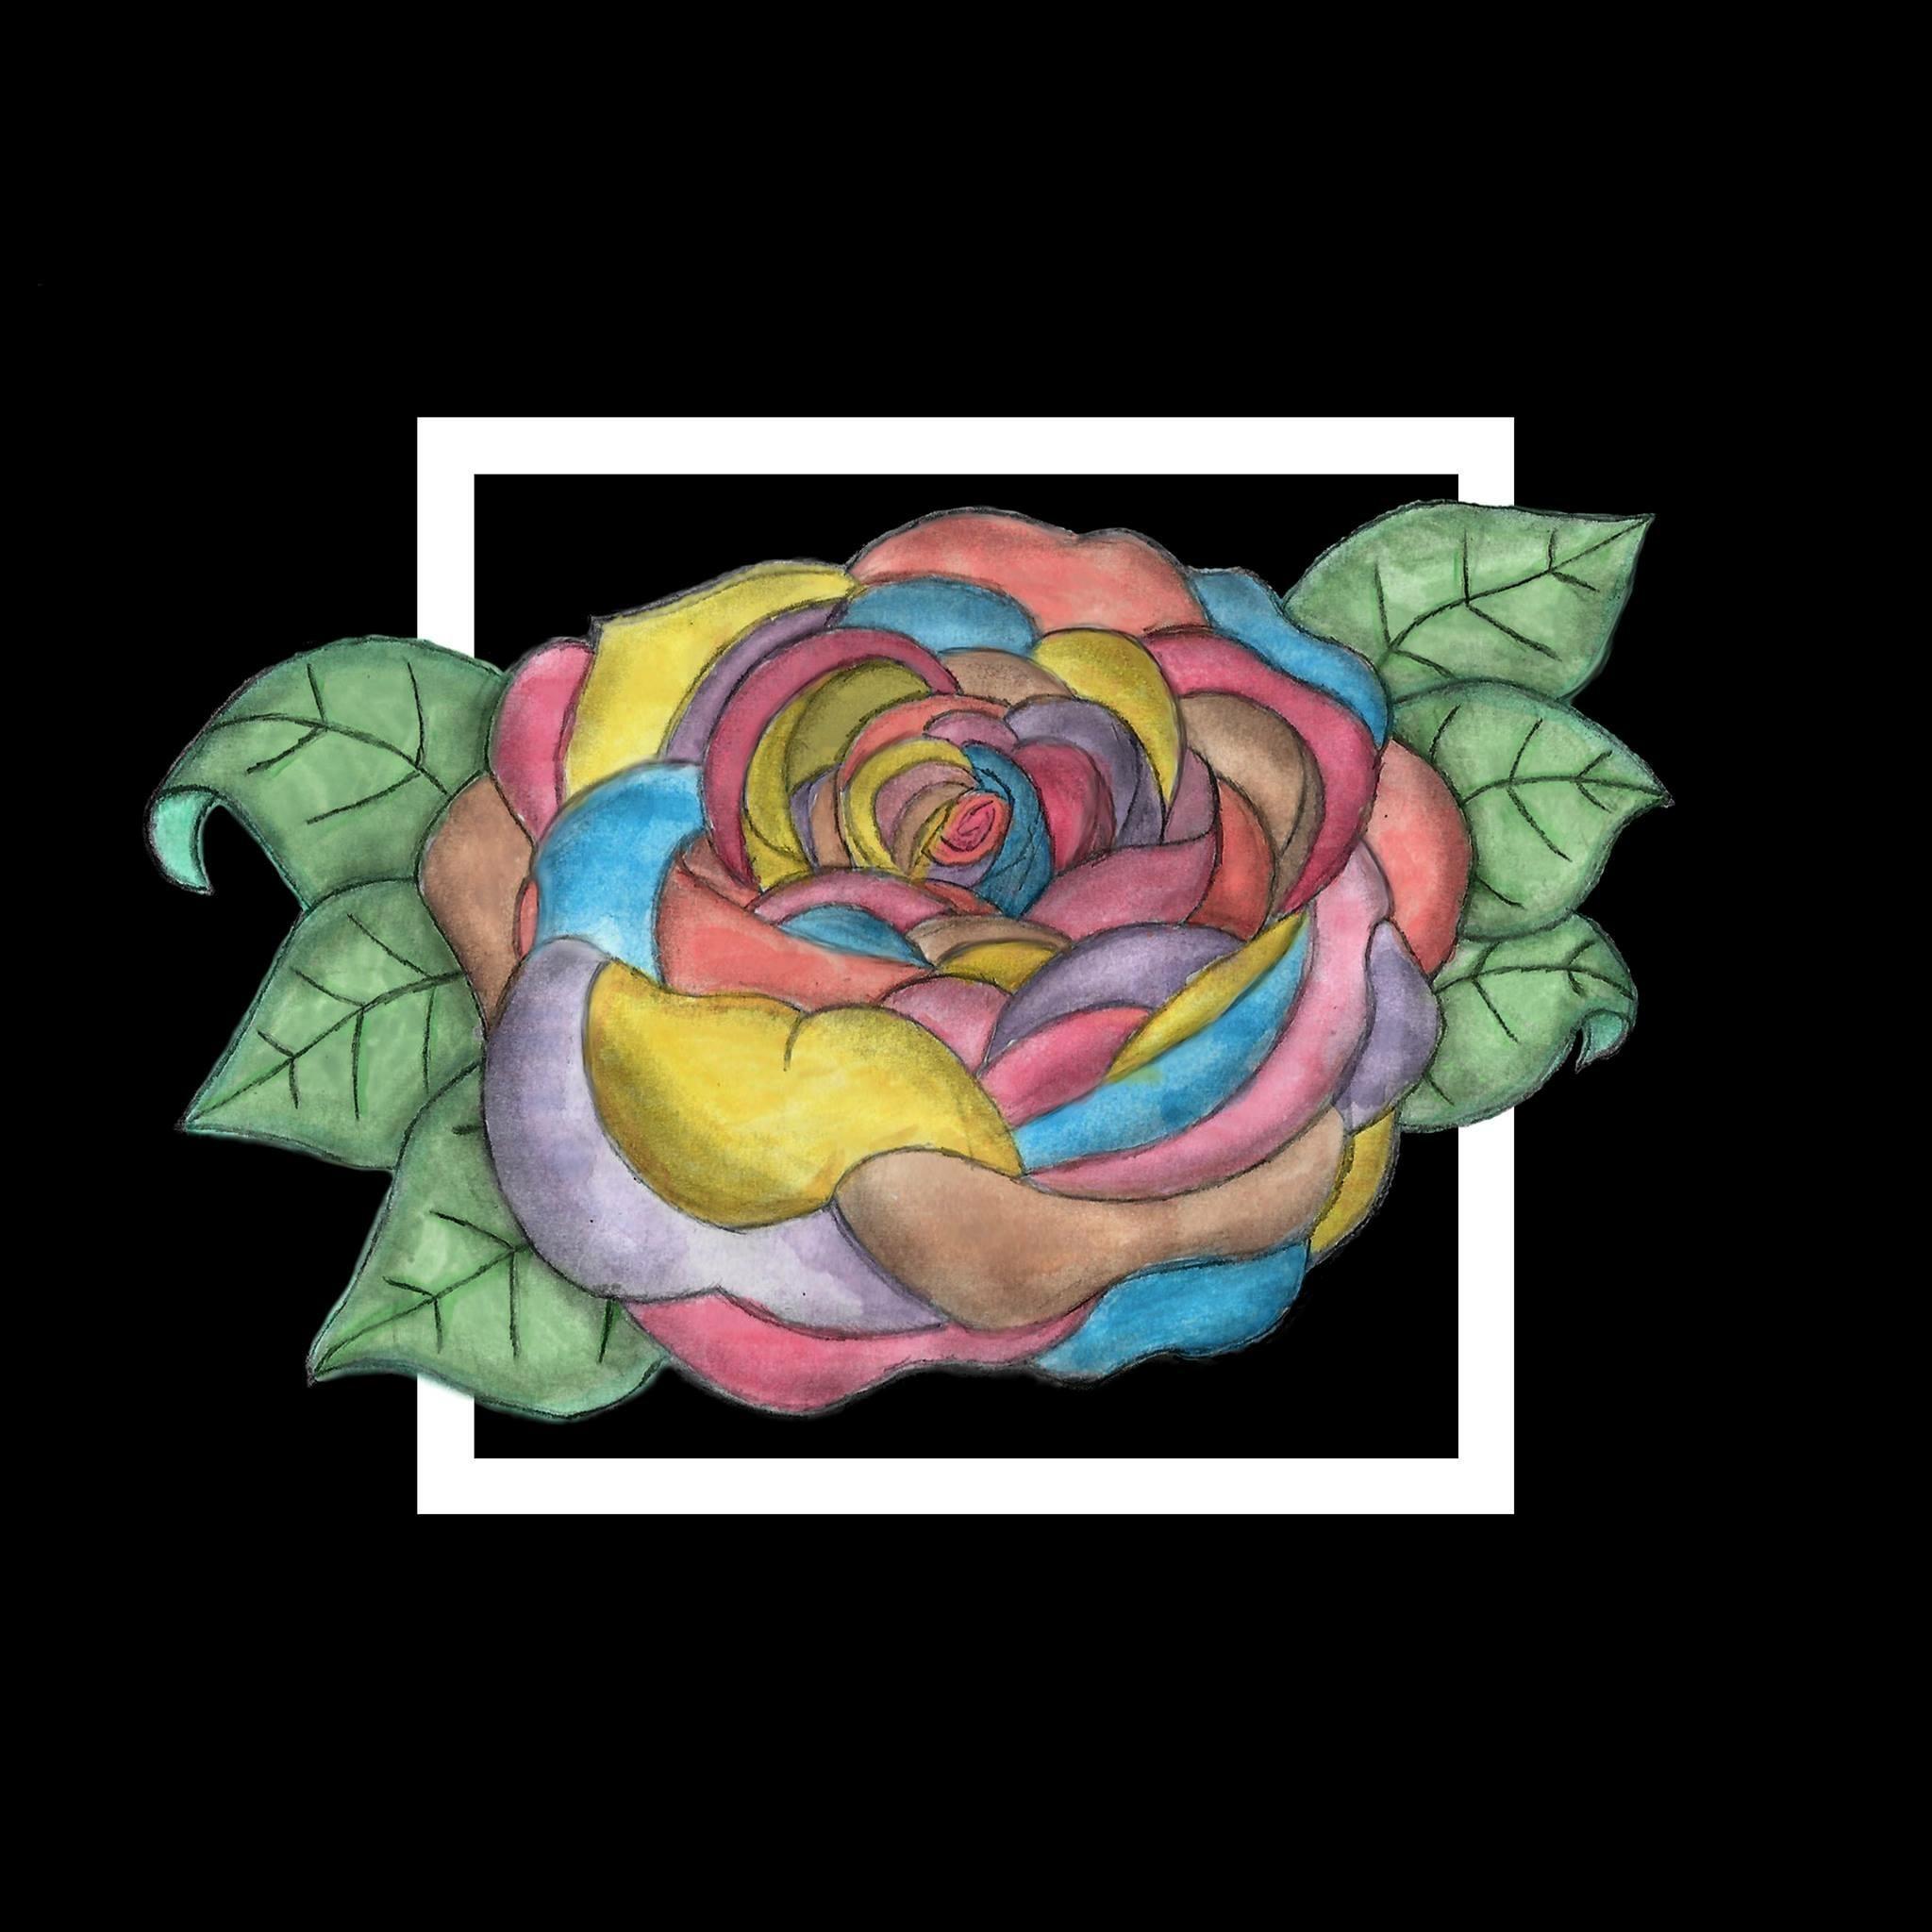 Dalka Rose